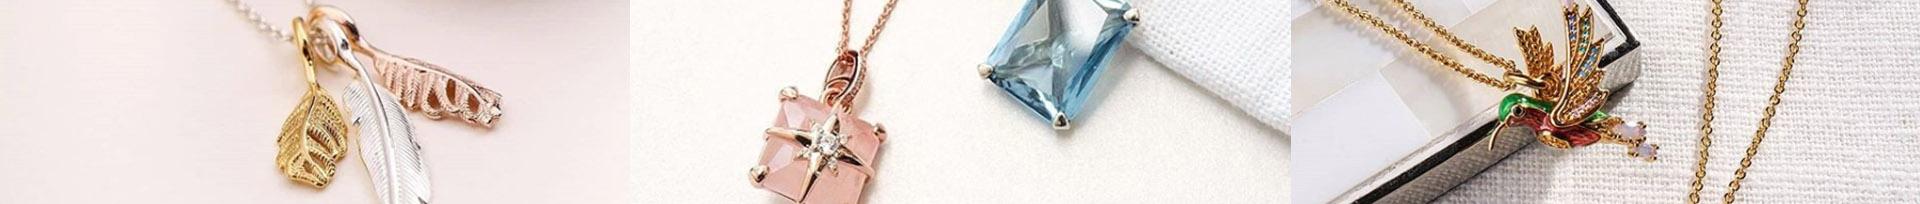 thomas-sabo-jewellery-category-banner1.jpg